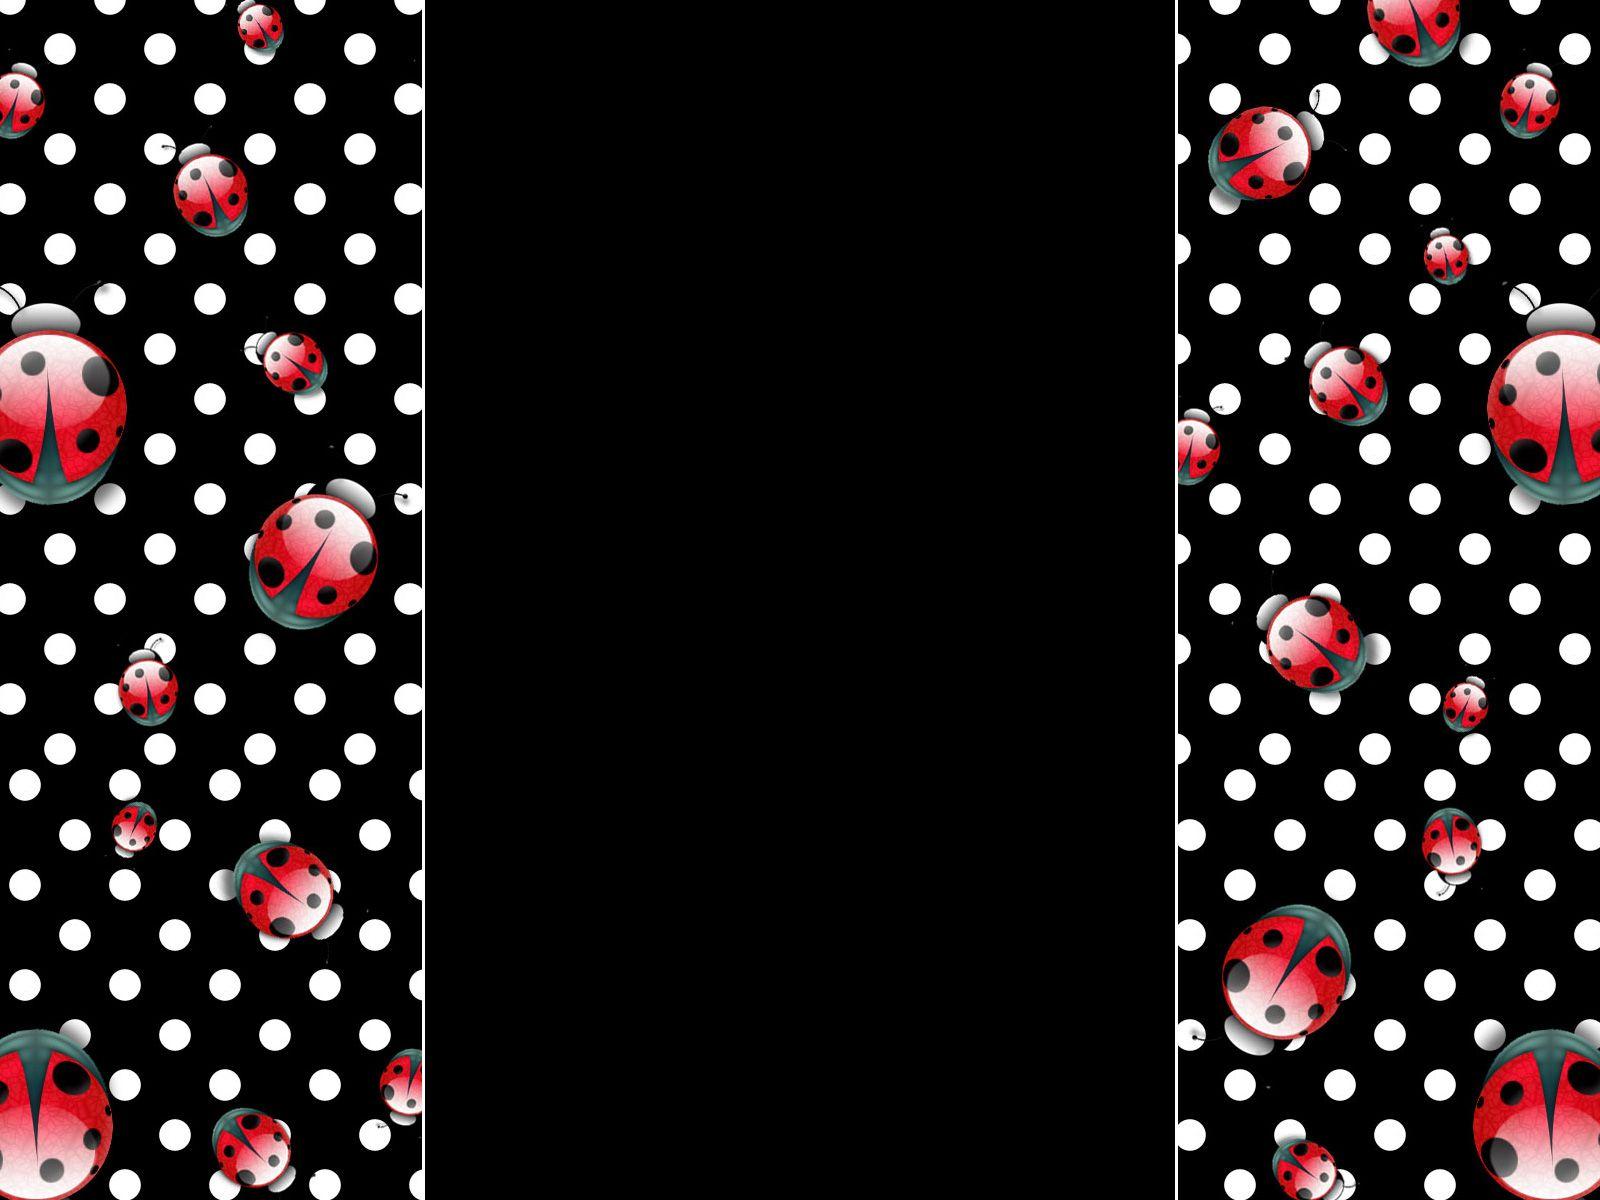 b.jpg (1600×1200) | LADY BUG BACKGROUND | Pinterest | Invitaciones ...